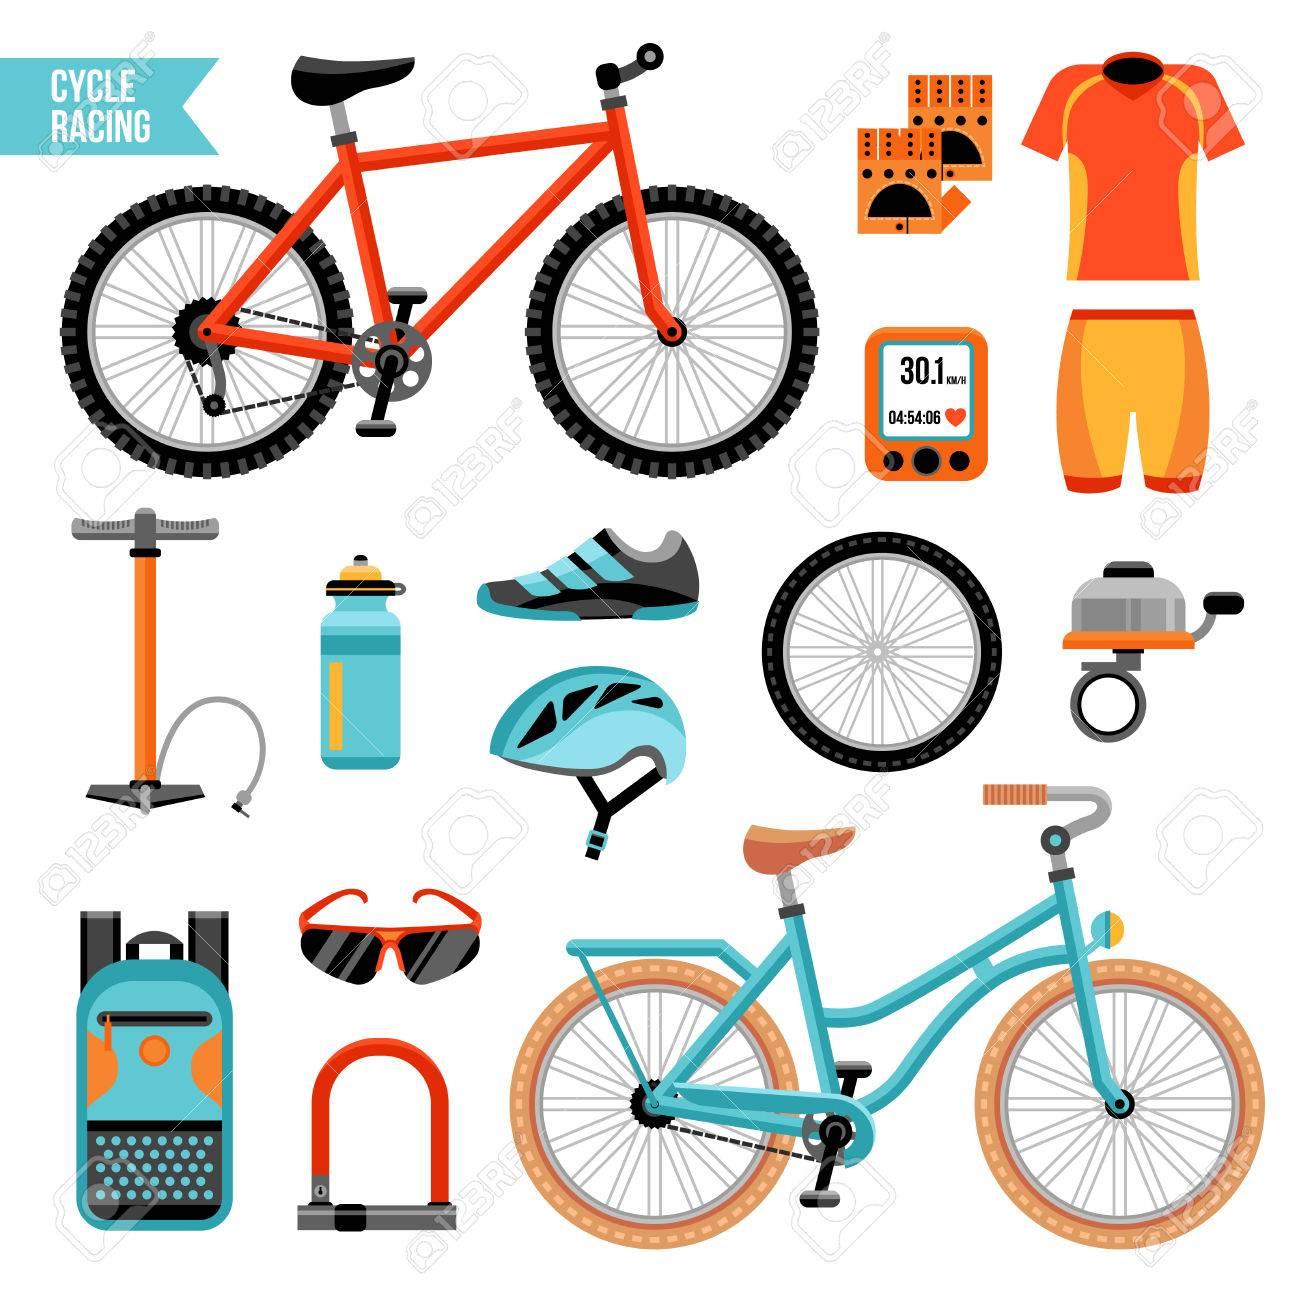 beBell Bike Accessoires Sonstige